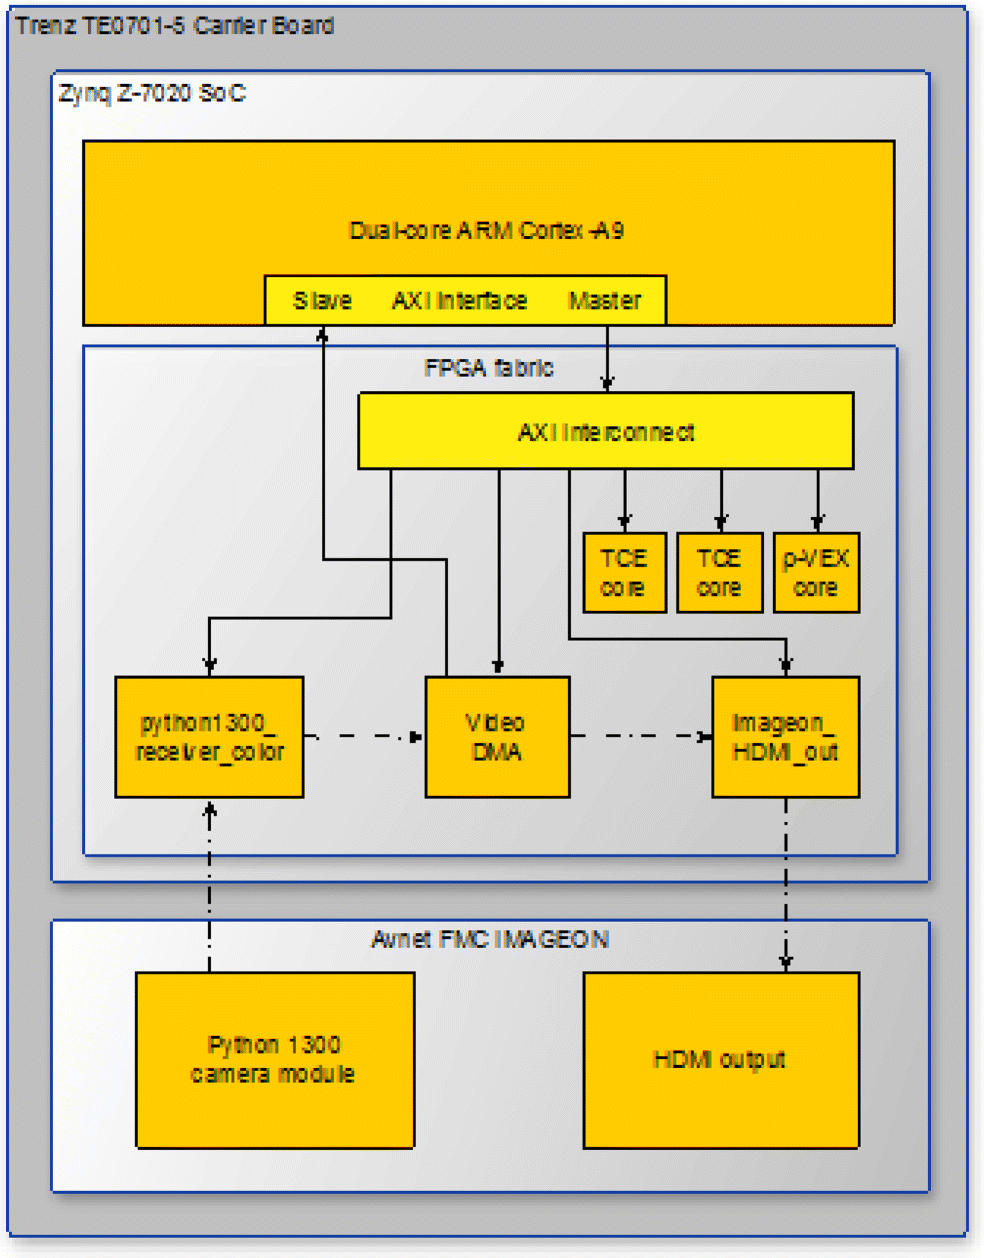 ALMARVI Execution Platform: Heterogeneous Video Processing SoC